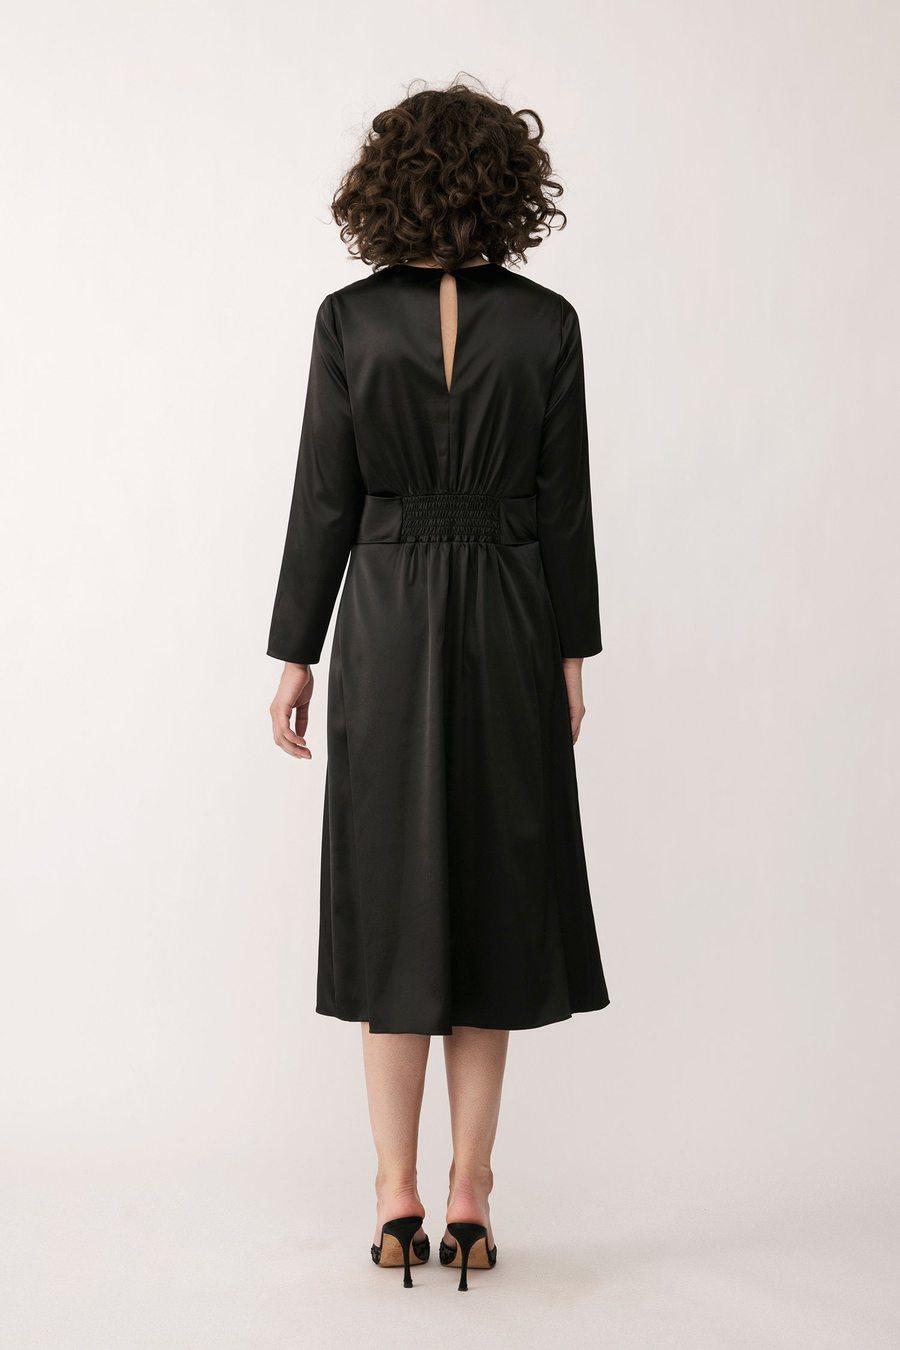 milano-dress-black-dress-stylein-946228_900x.jpg